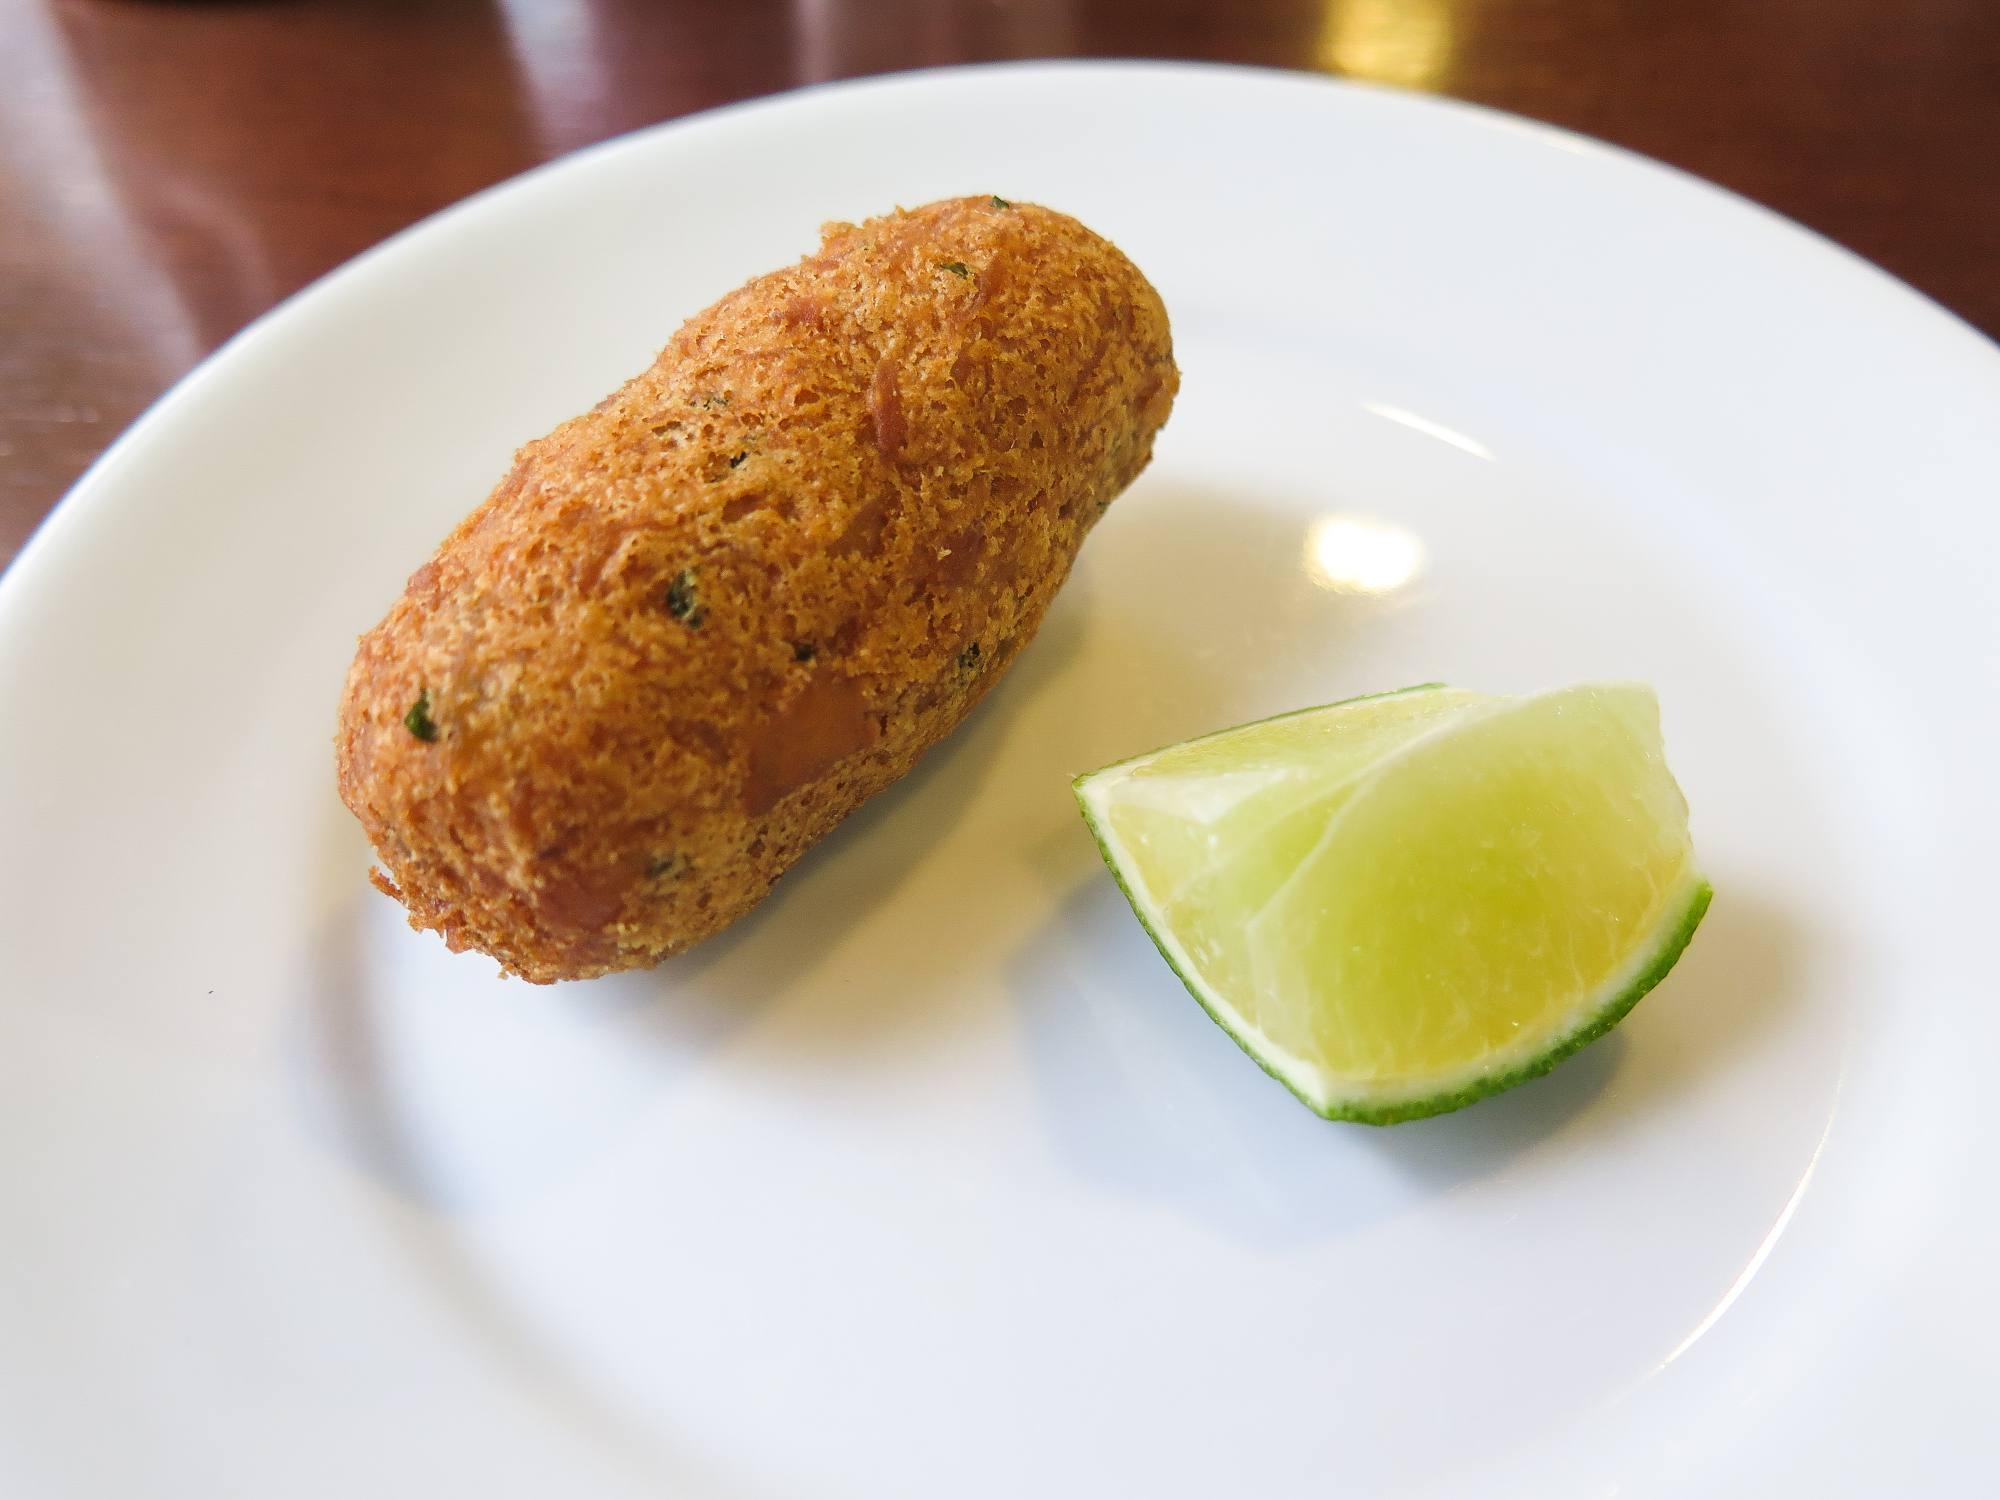 Dumpling on plat next to lime.